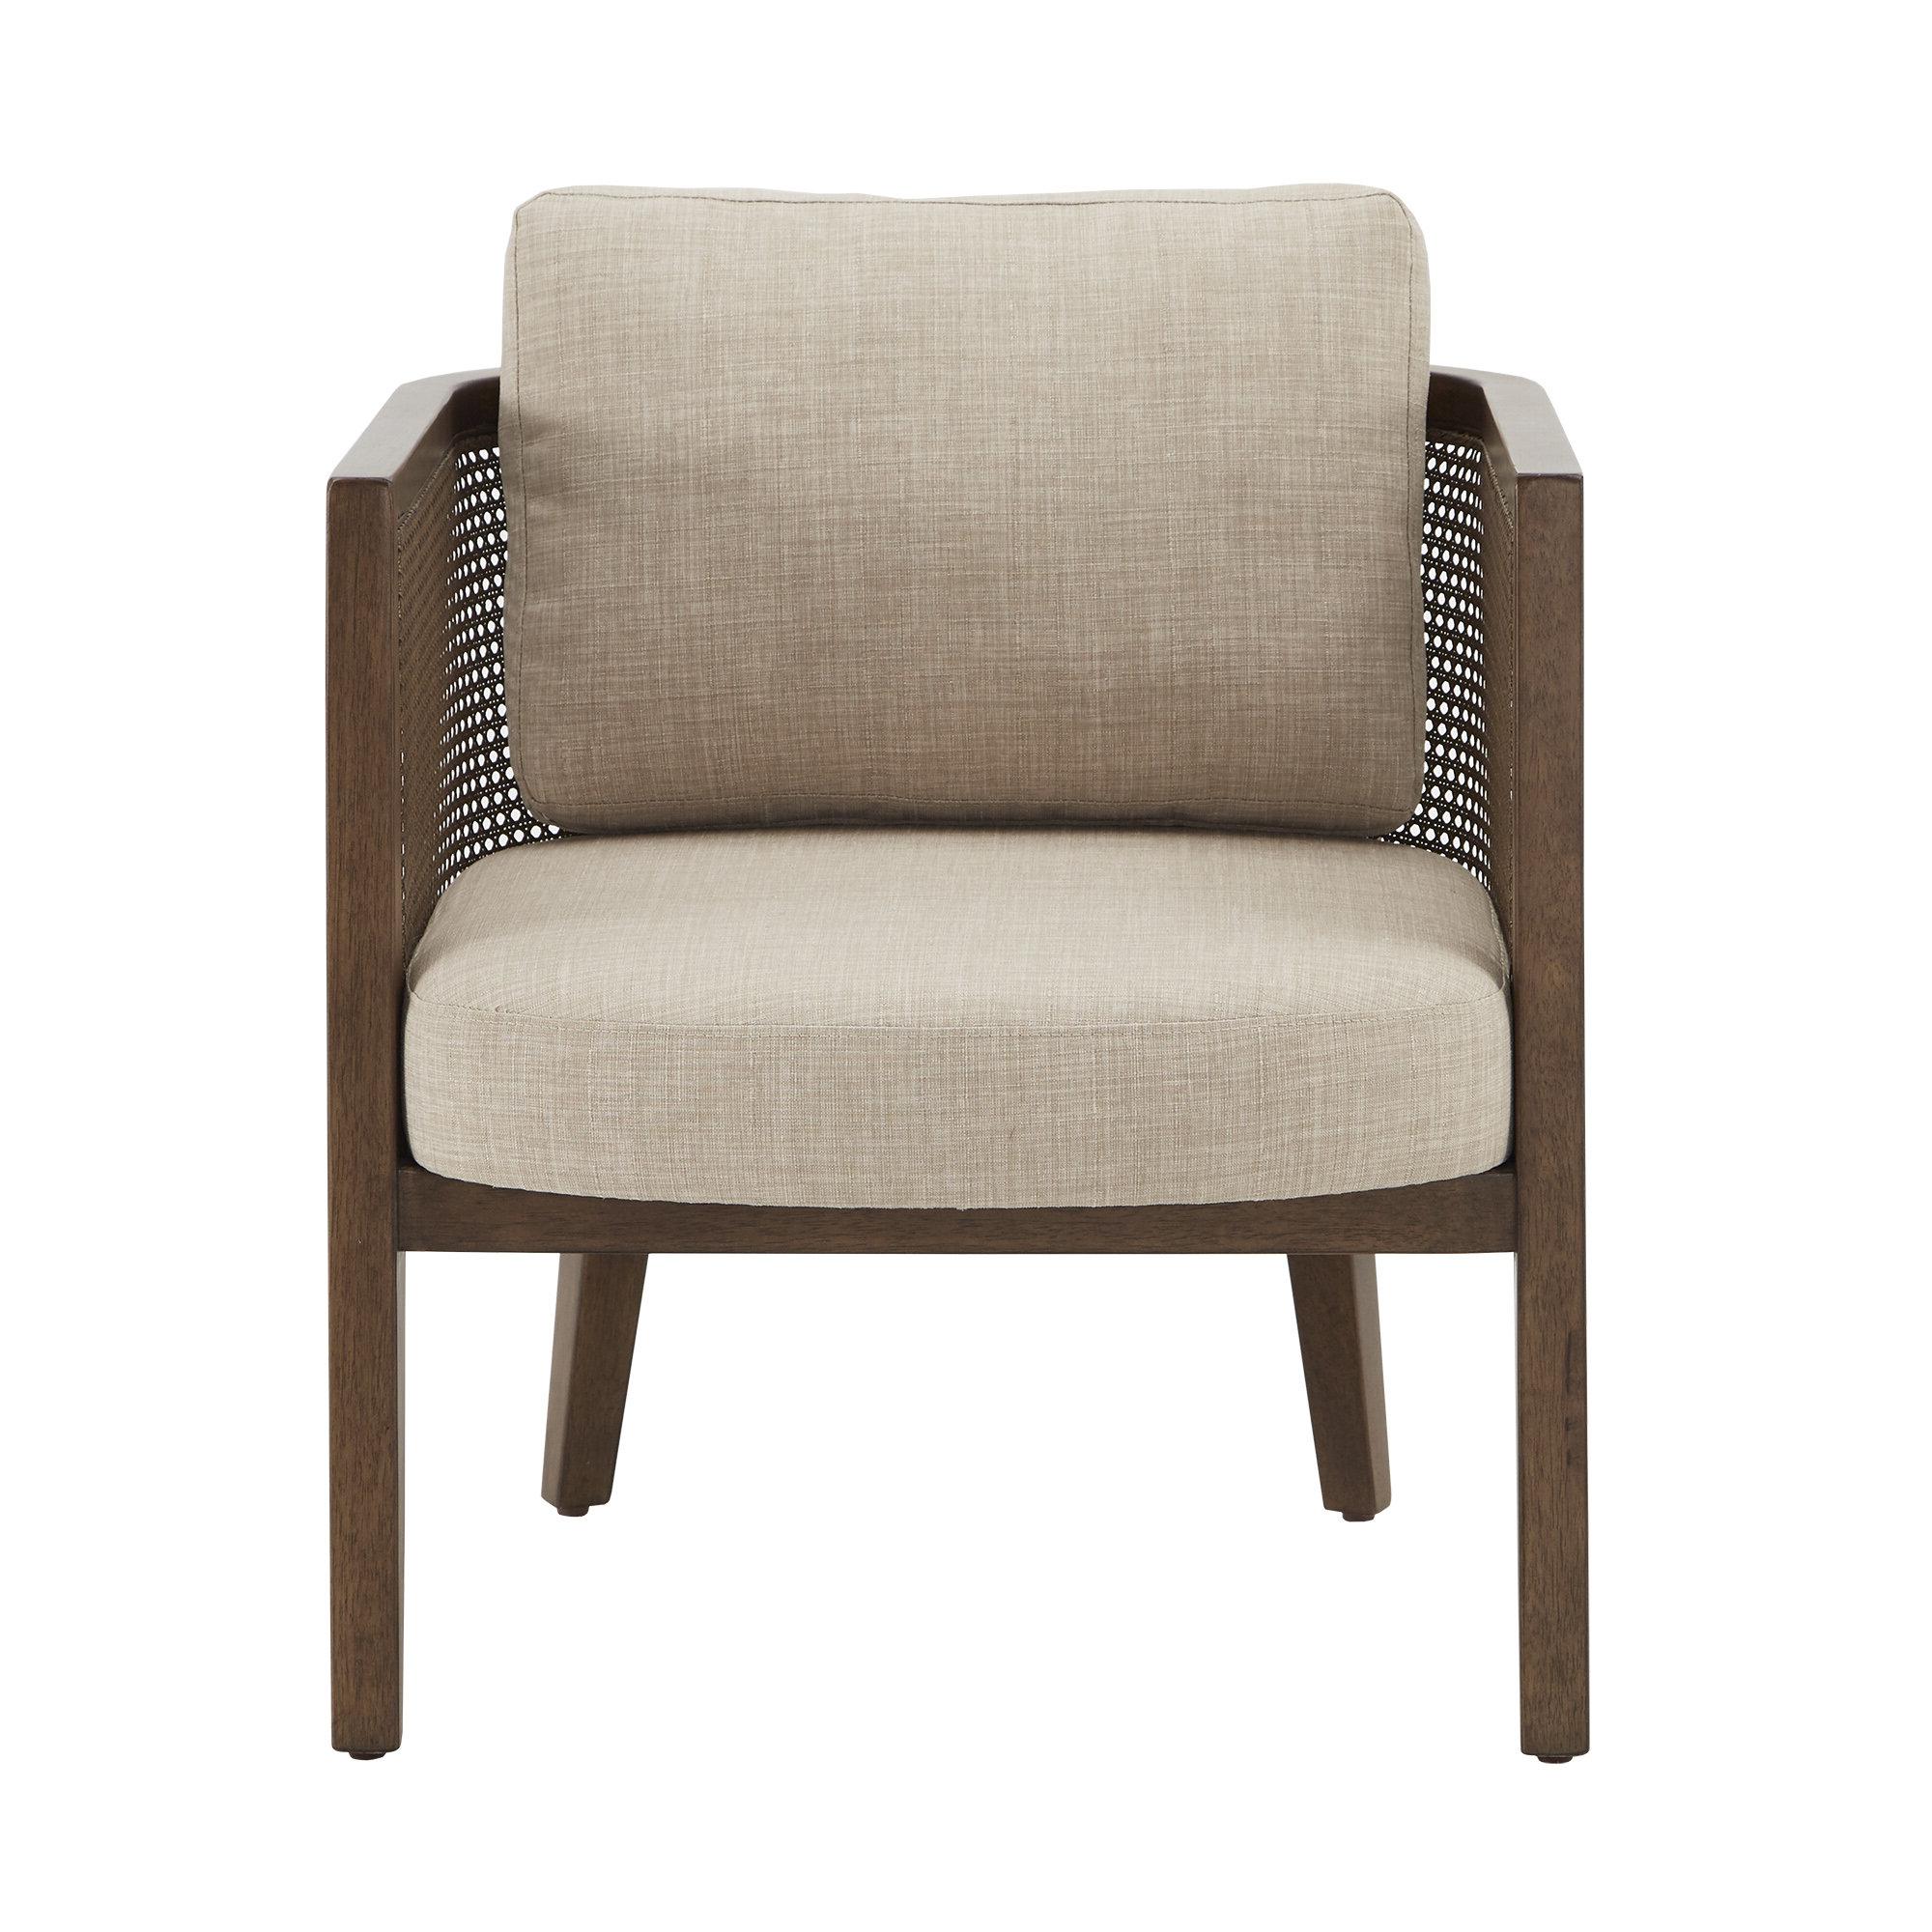 "Boisvert 27"" W Polyester Blend Armchair In Newest Polyester Blend Armchairs (View 11 of 20)"